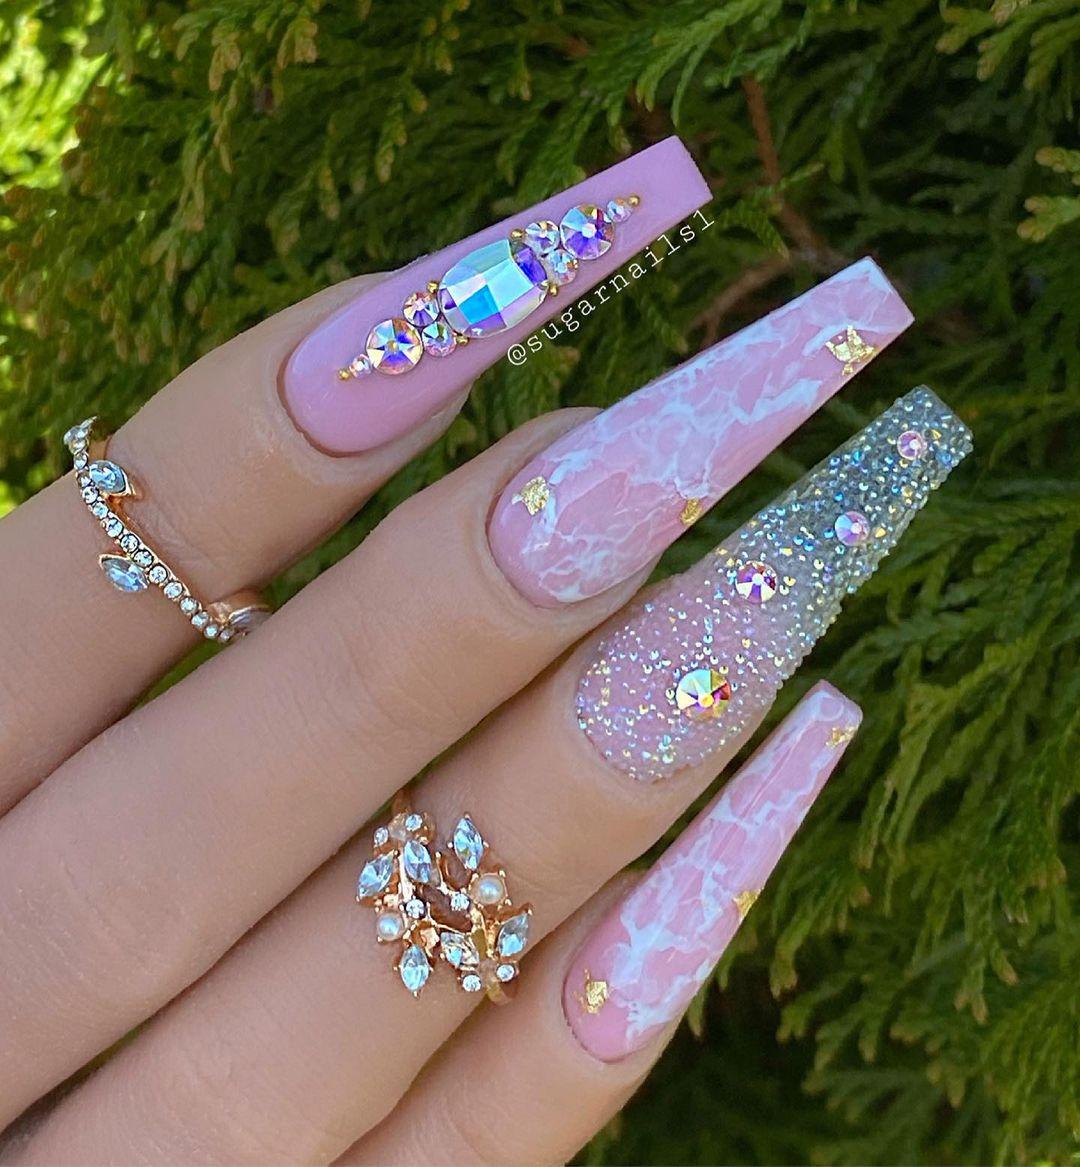 Soft pink marble rhinestone nails